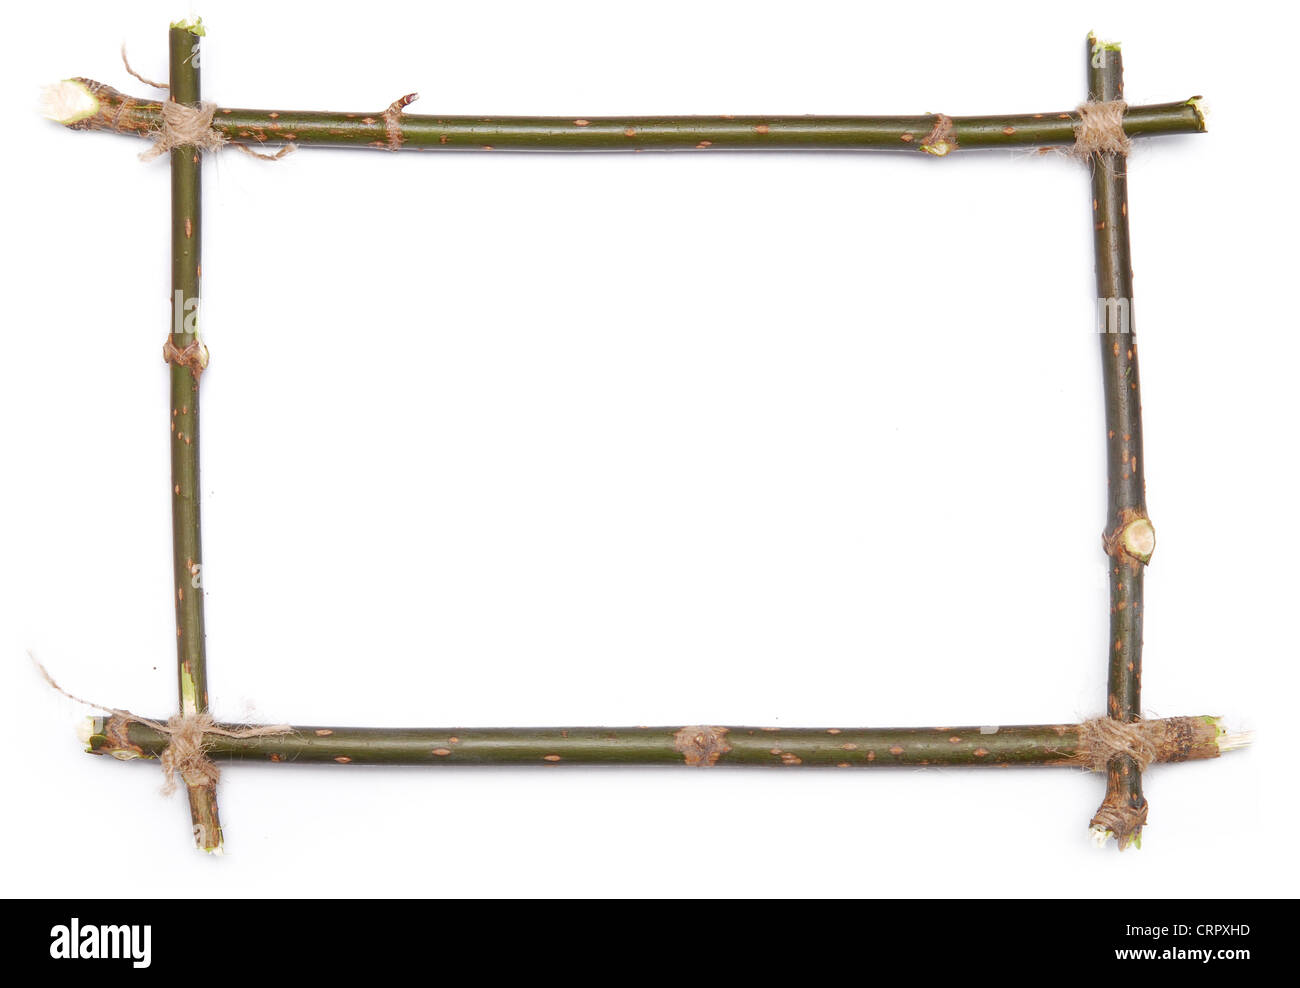 twig frame over white background - Stock Image